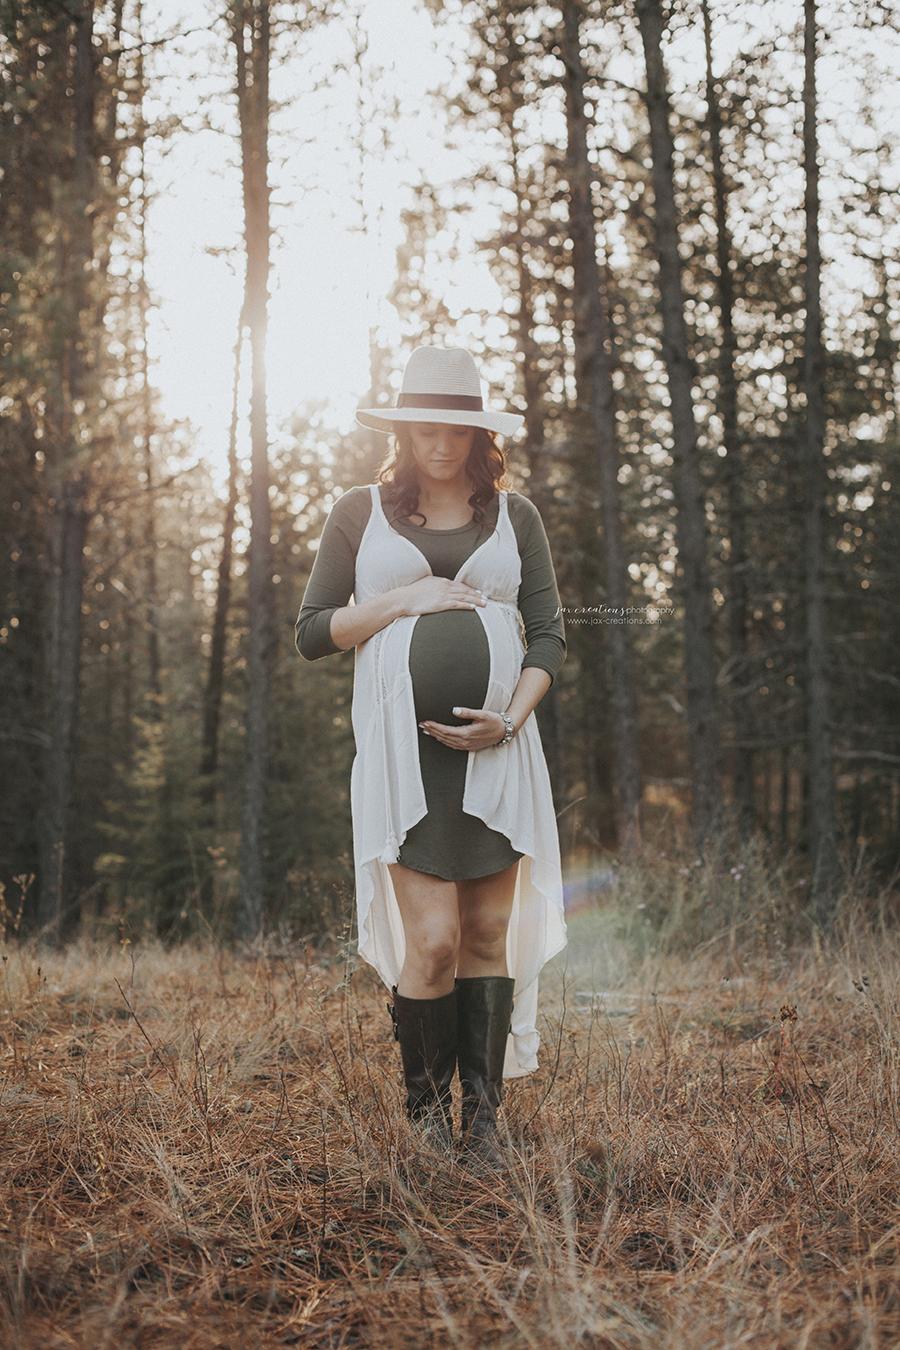 Jax Creations Photography, maternity photography, maternity, pregnancy, coeur dalene photographer, baby photographer